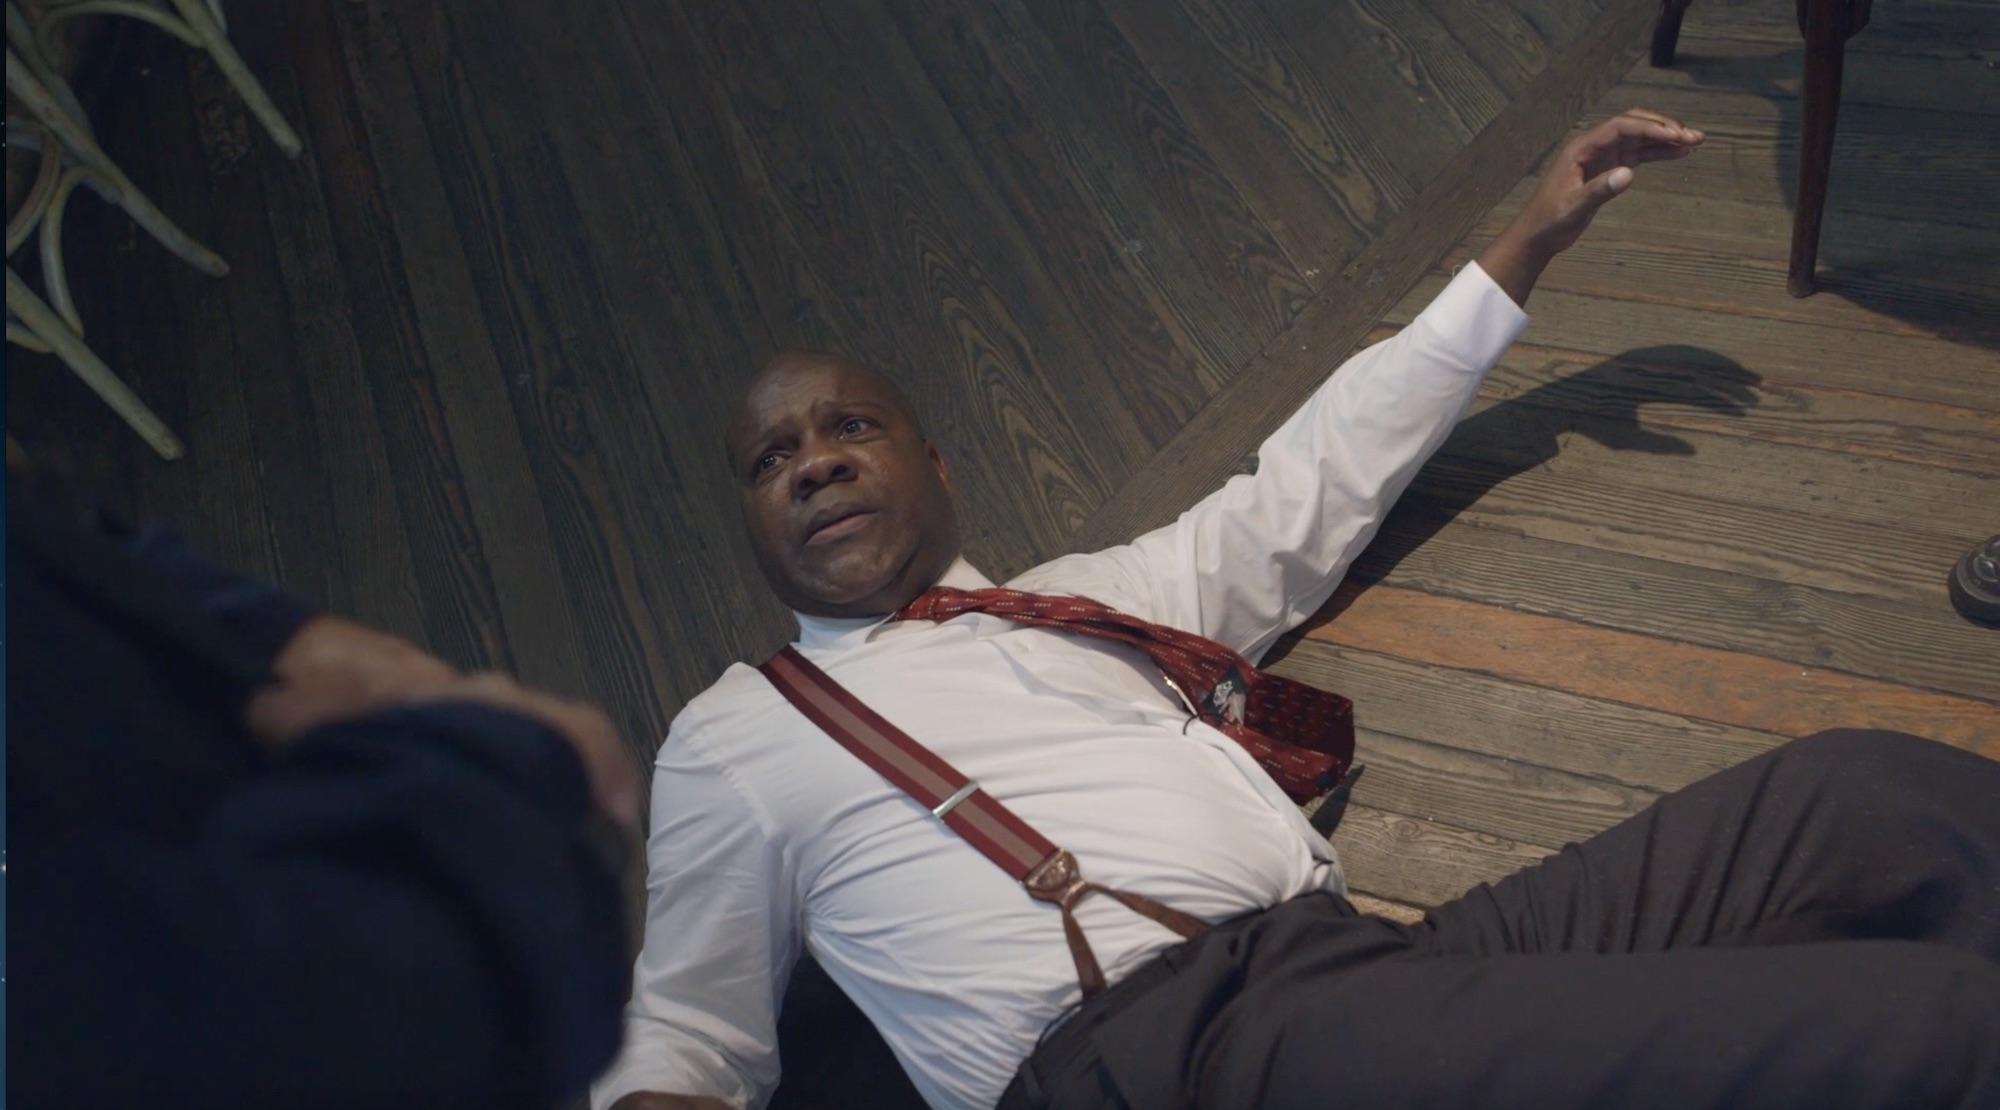 Brooklyn In July - Thaddeus Daniels as Frank Walker (Photo credit - Ken Kotowski)